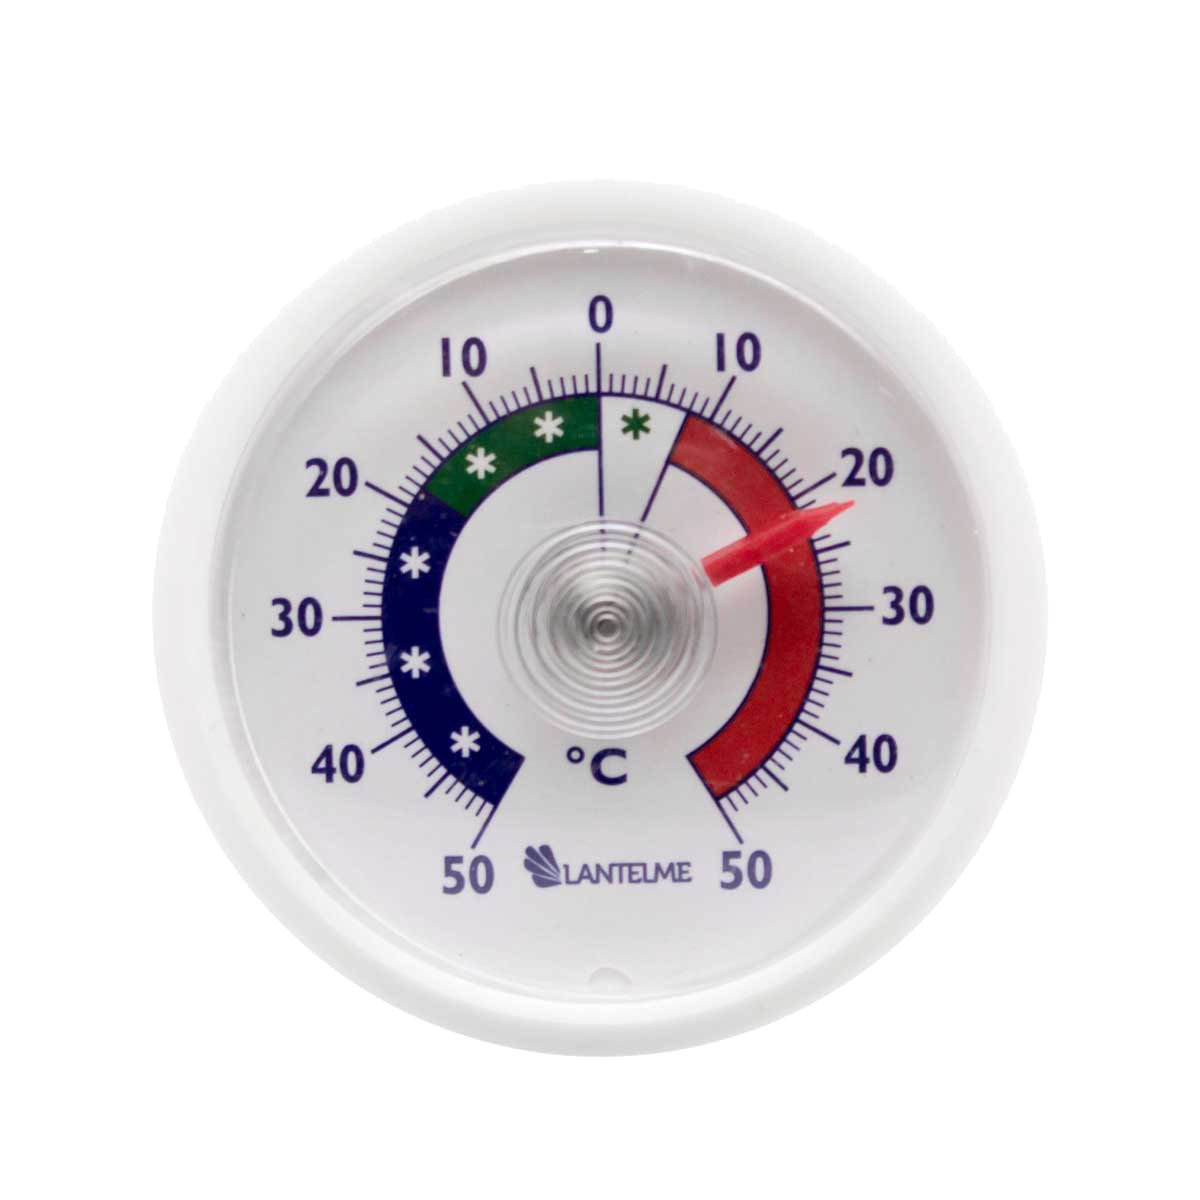 Adhesivo de termómetro analógico refrigerador redondo bimetálico. pantalla de temperatura termómetro frigorífico + / - 50 ° c Lantelme